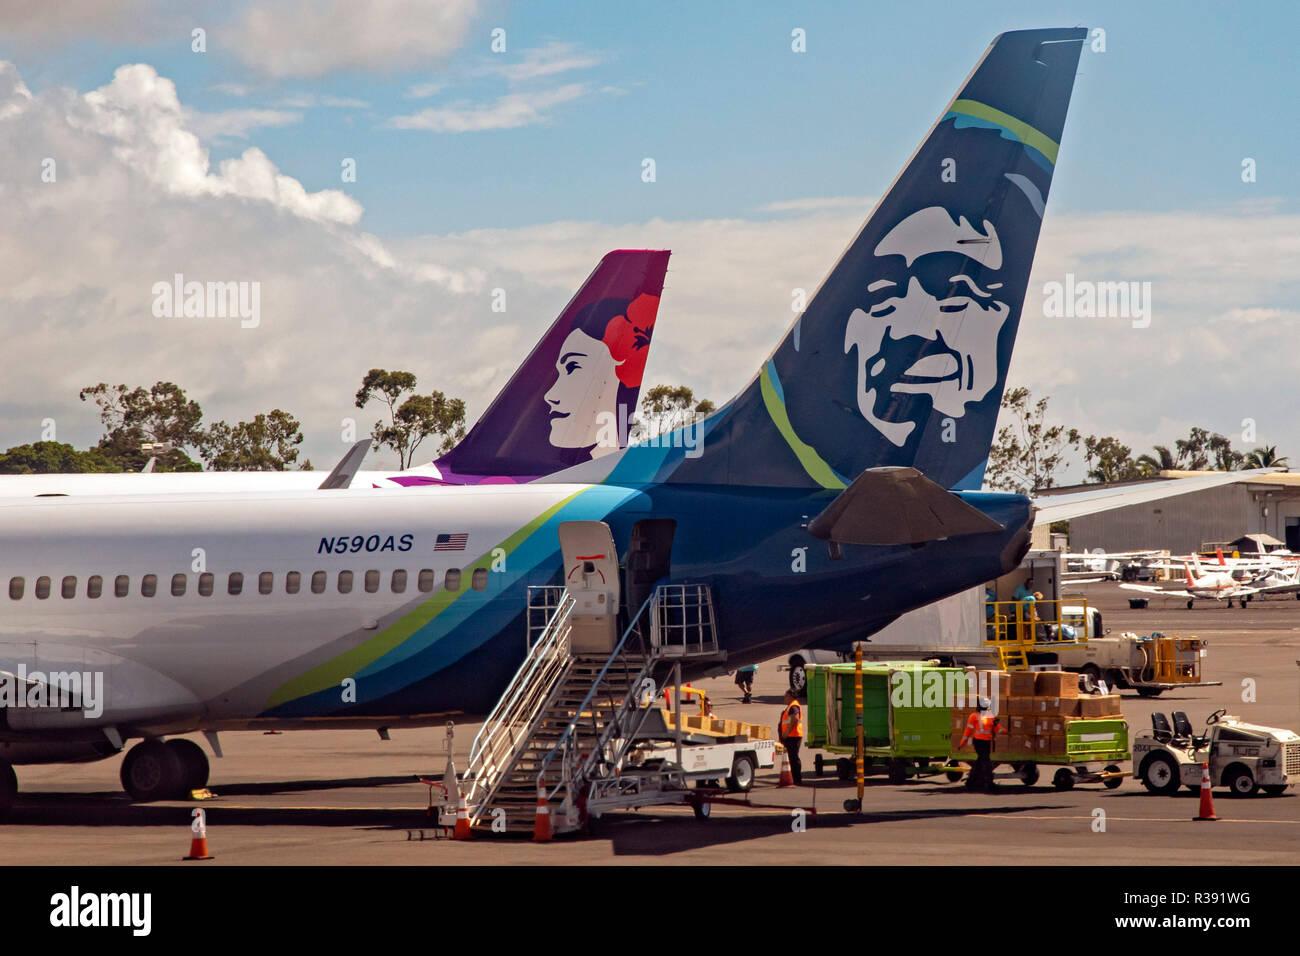 Kailua-Kona, Hawaii - Alaska Airlines e Hawaiian Airlines jet all'Aeroporto Internazionale di Kona su la Big Island delle Hawaii. Foto Stock